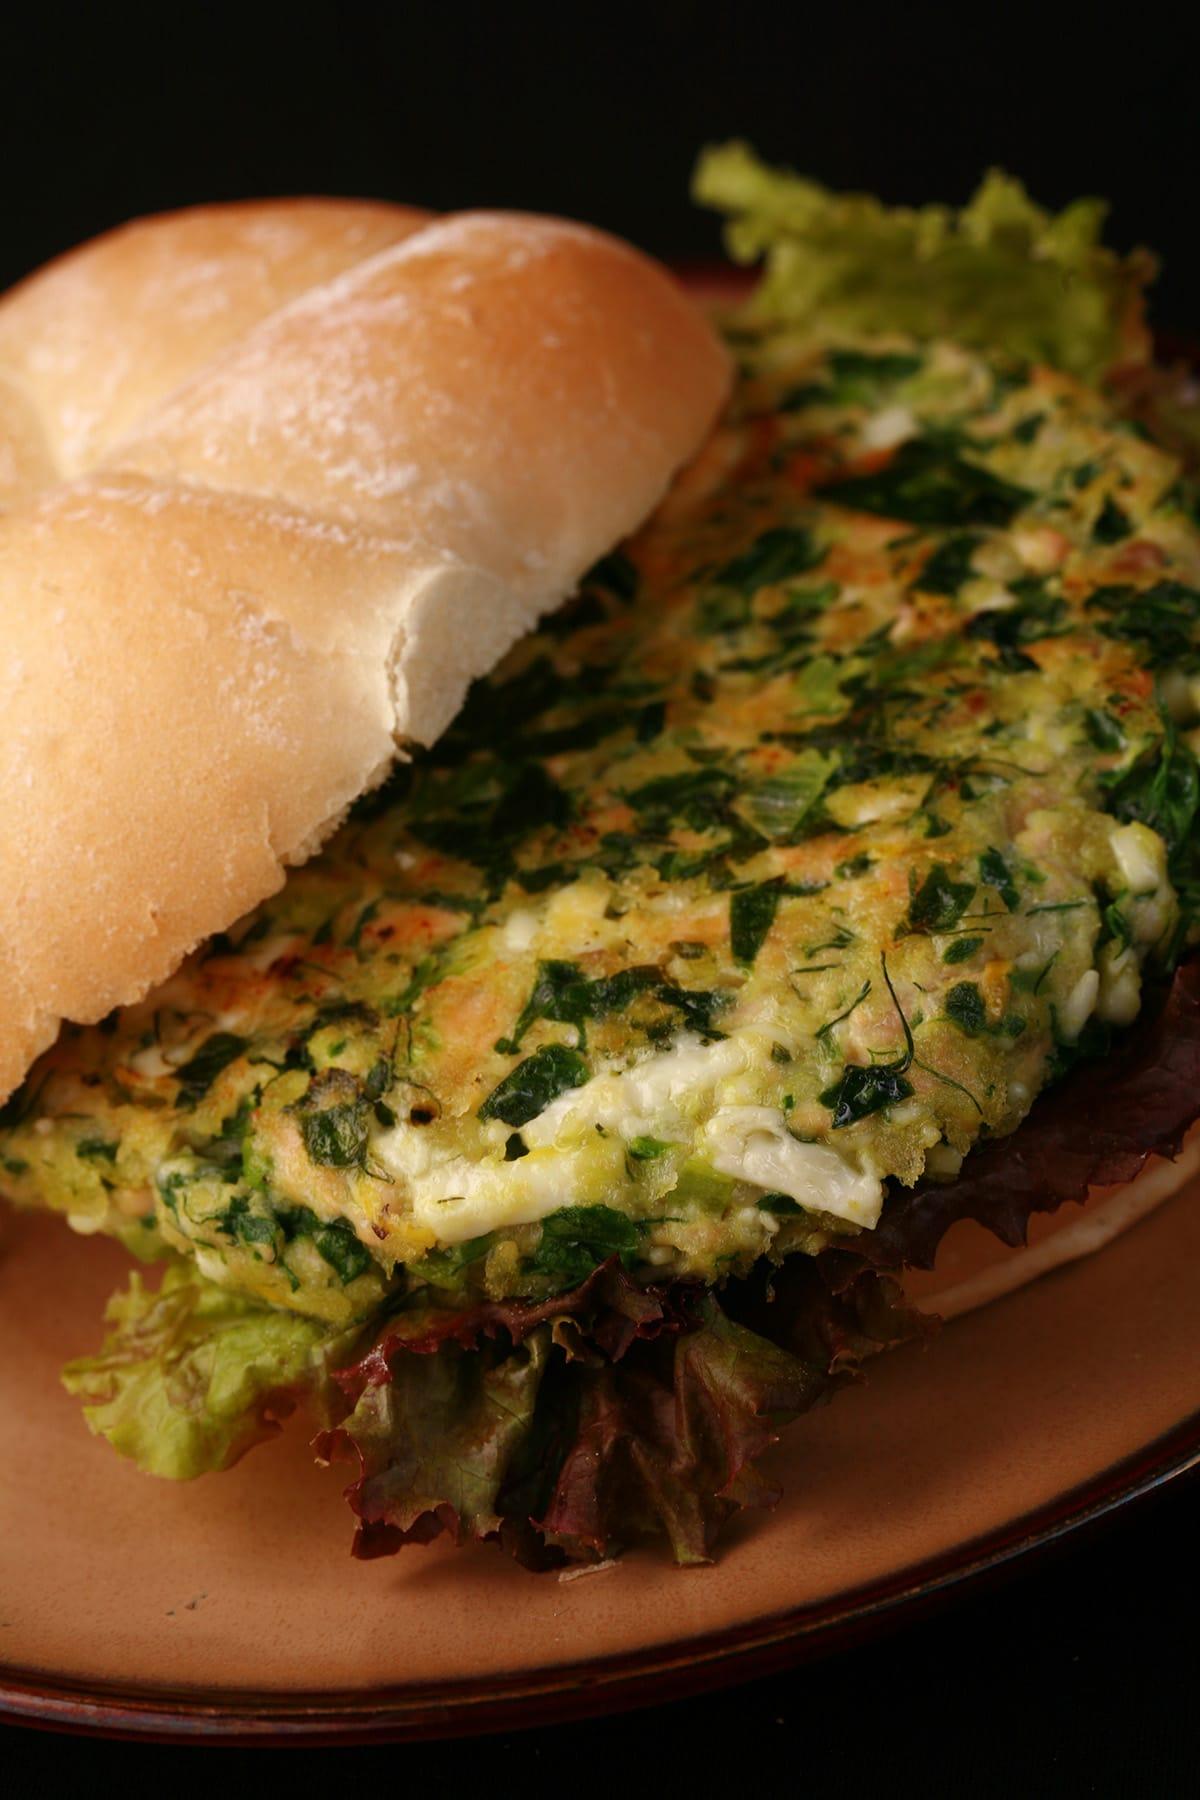 A salmon feta salmon burger, on a kaiser bun, with red lettuce under the patty.